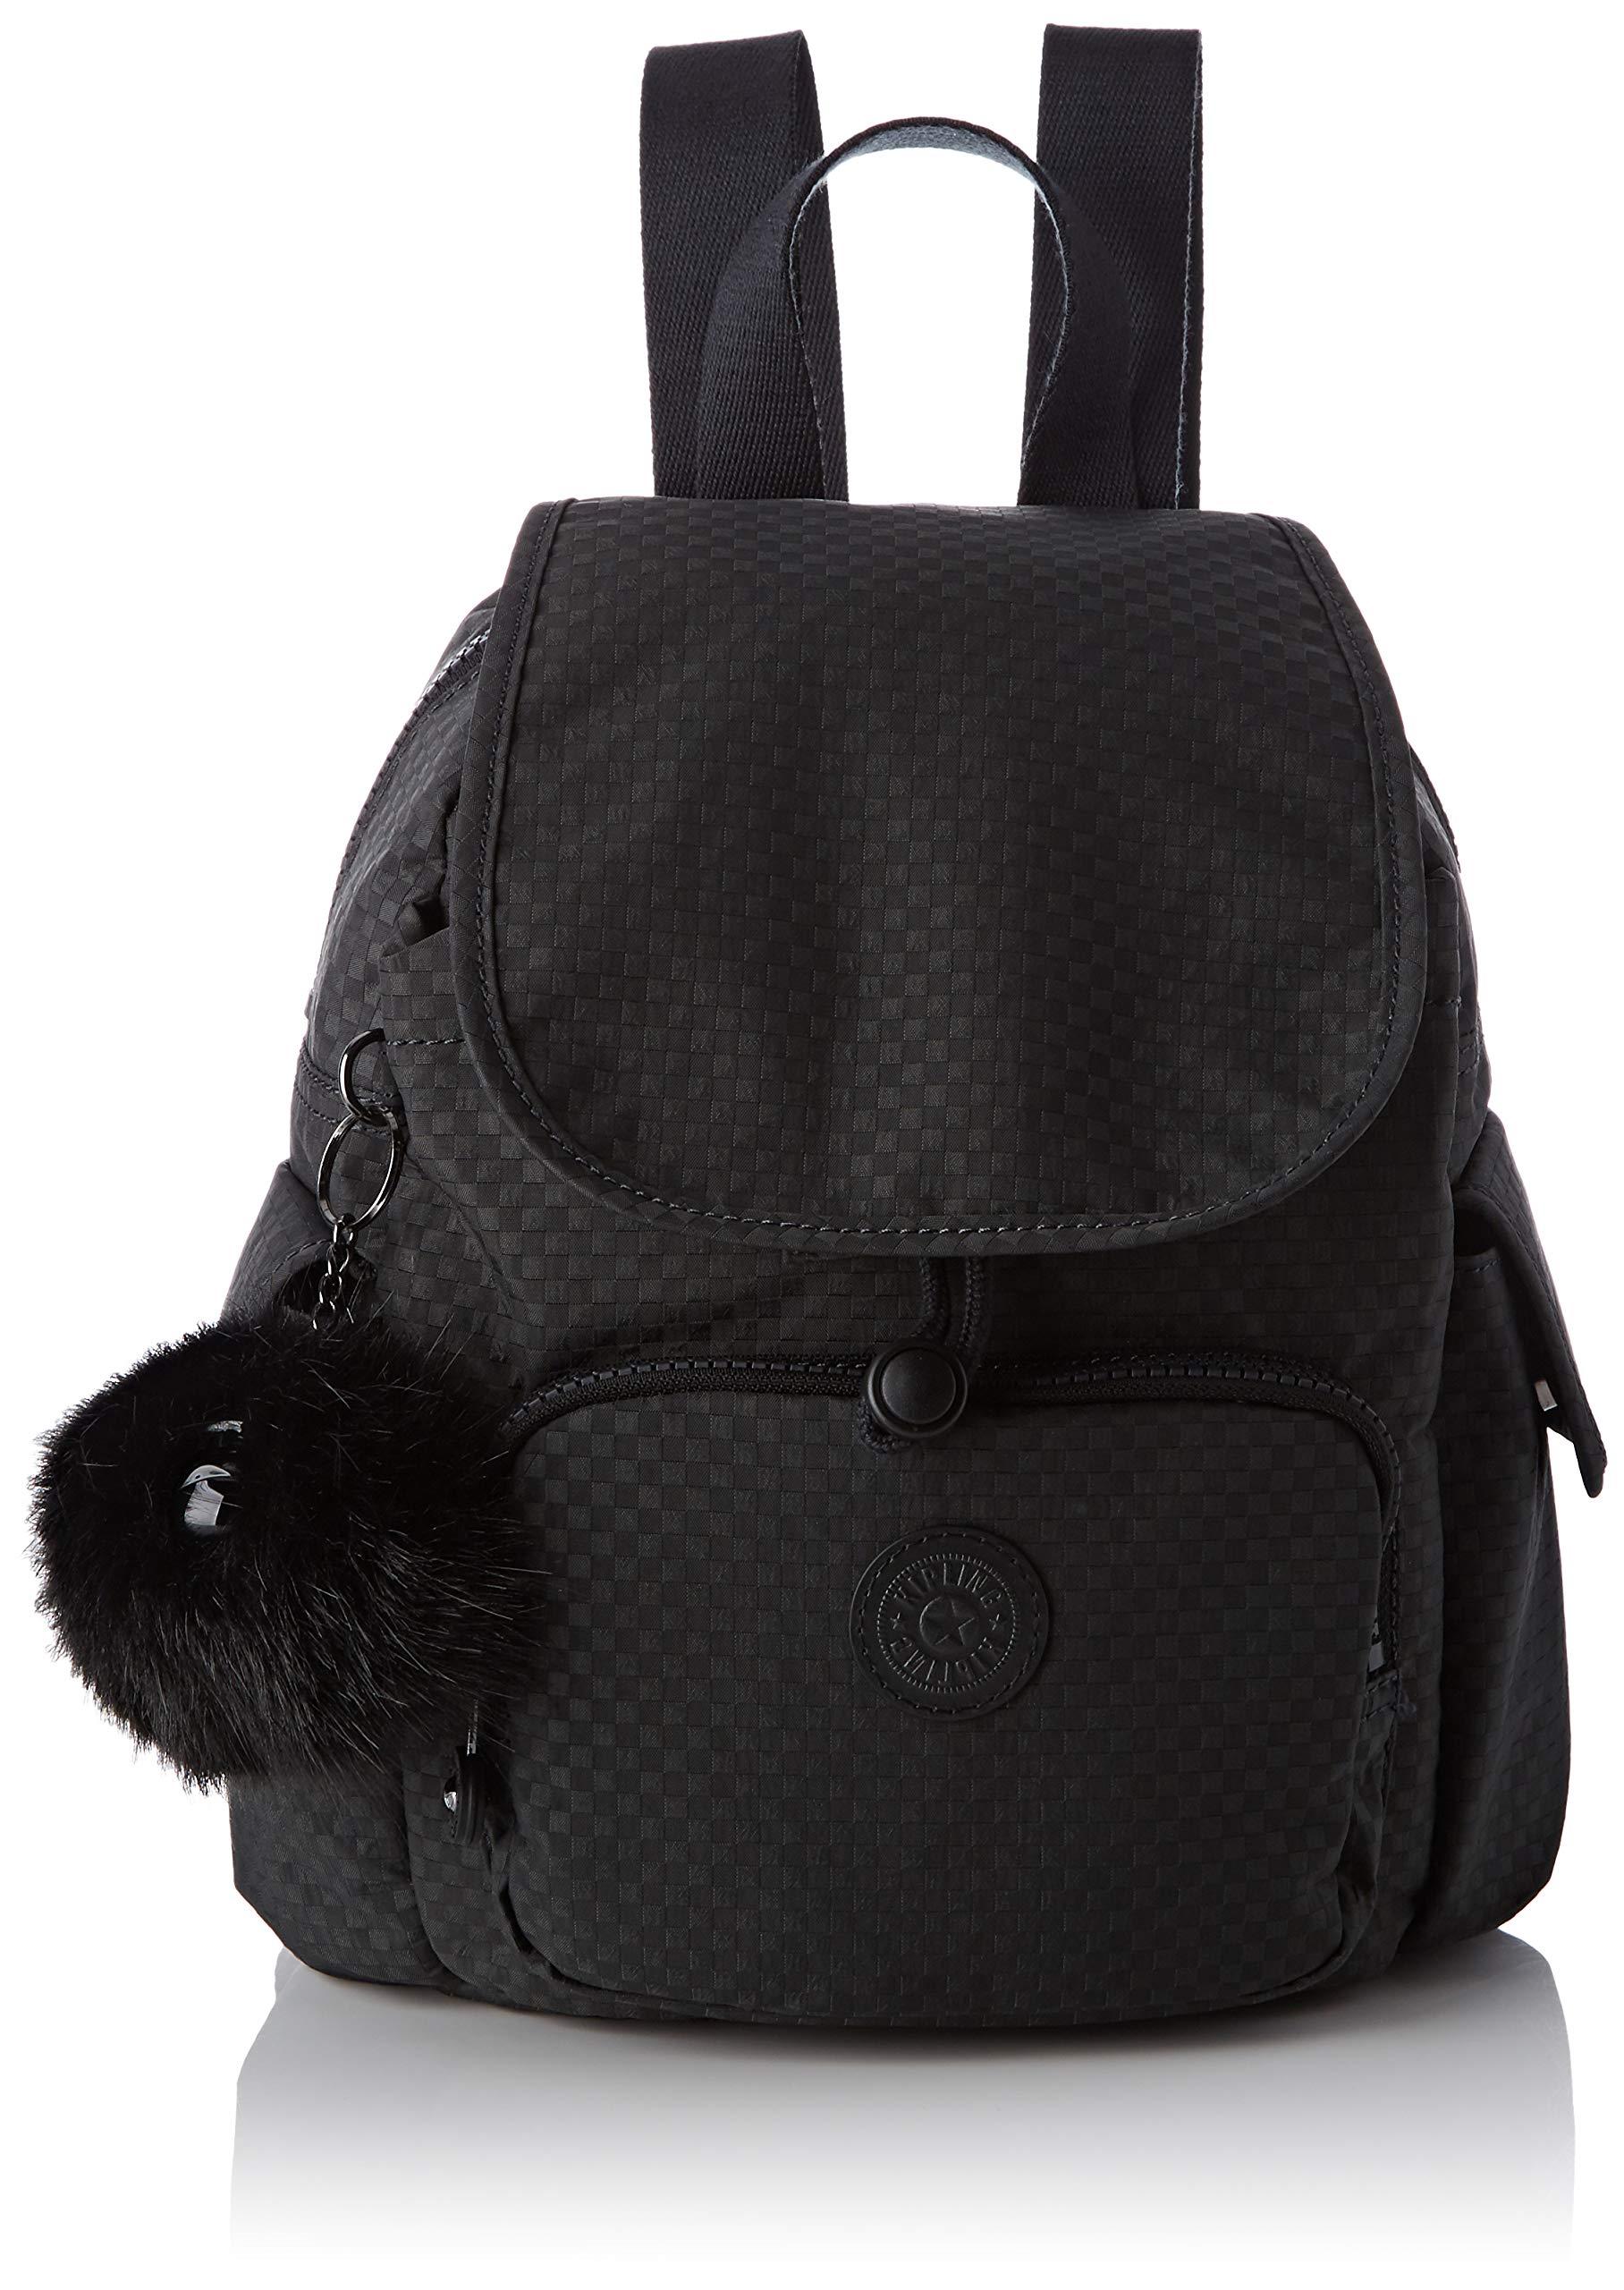 Black MiniSacs Pack City Kipling À Dos FemmeNoirpowder CBordexW